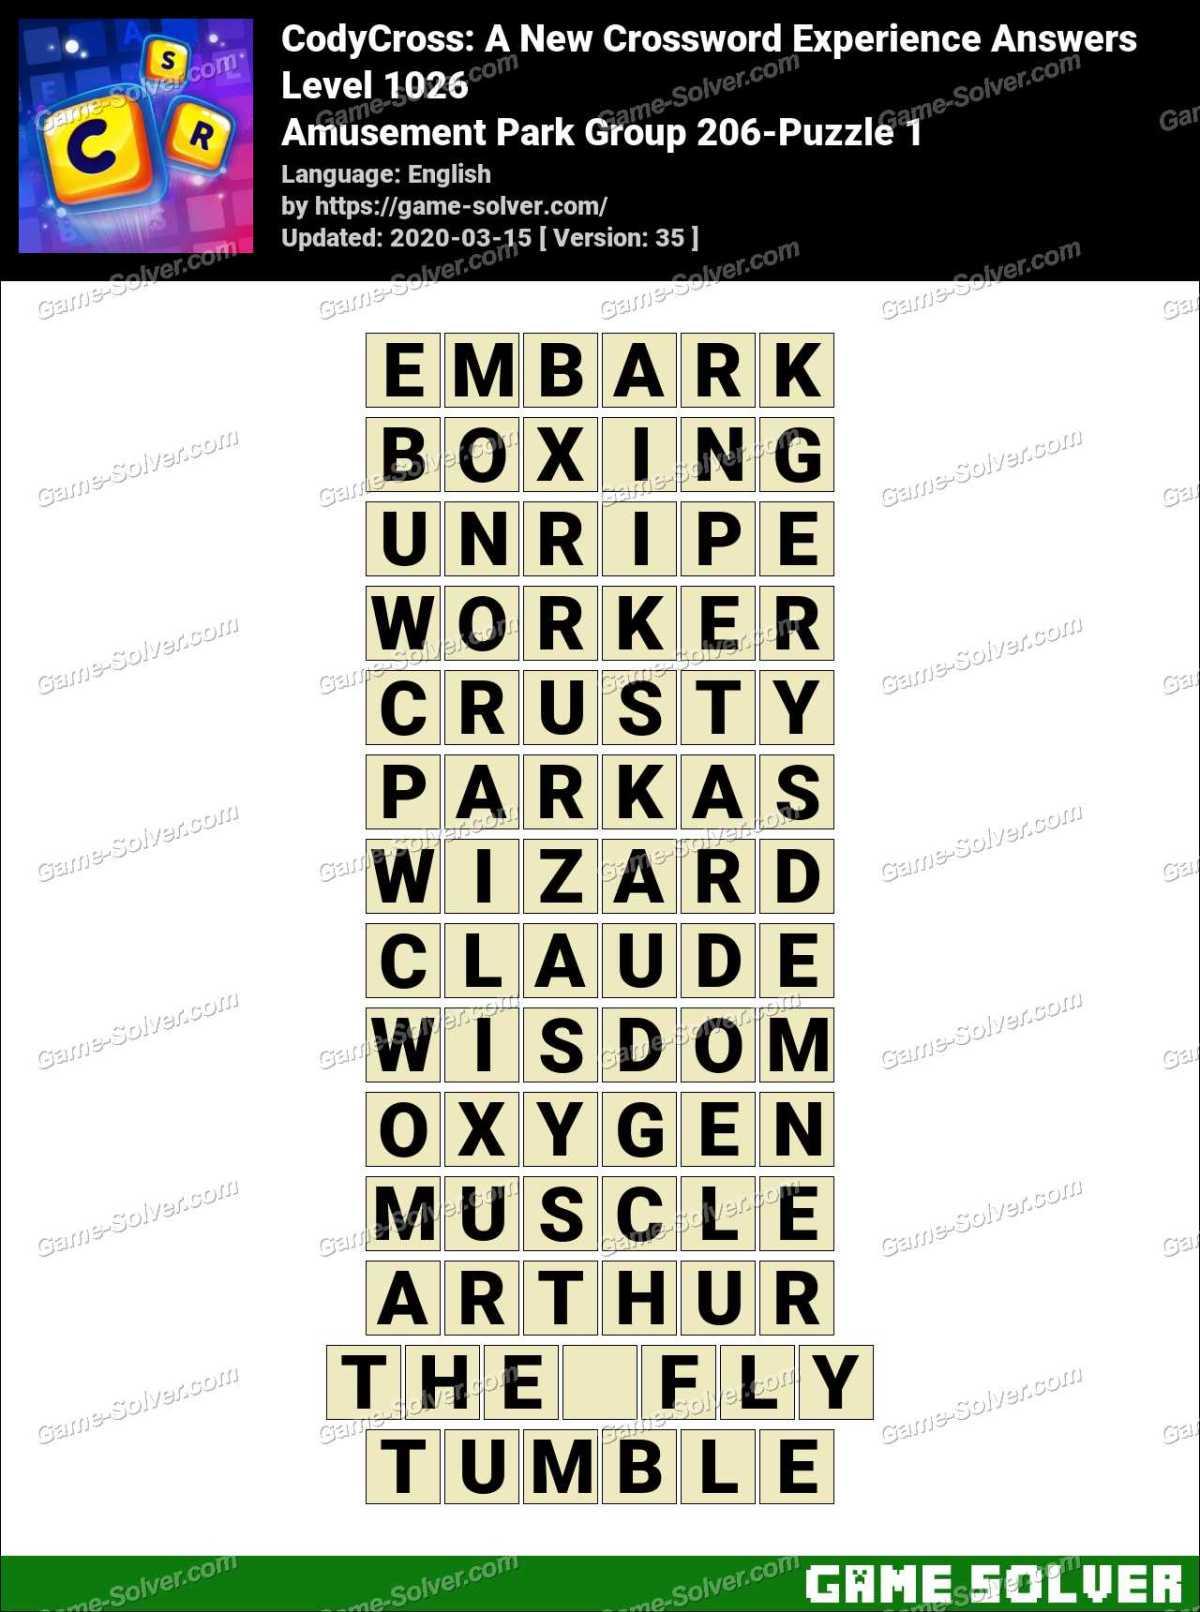 CodyCross Amusement Park Group 206-Puzzle 1 Answers